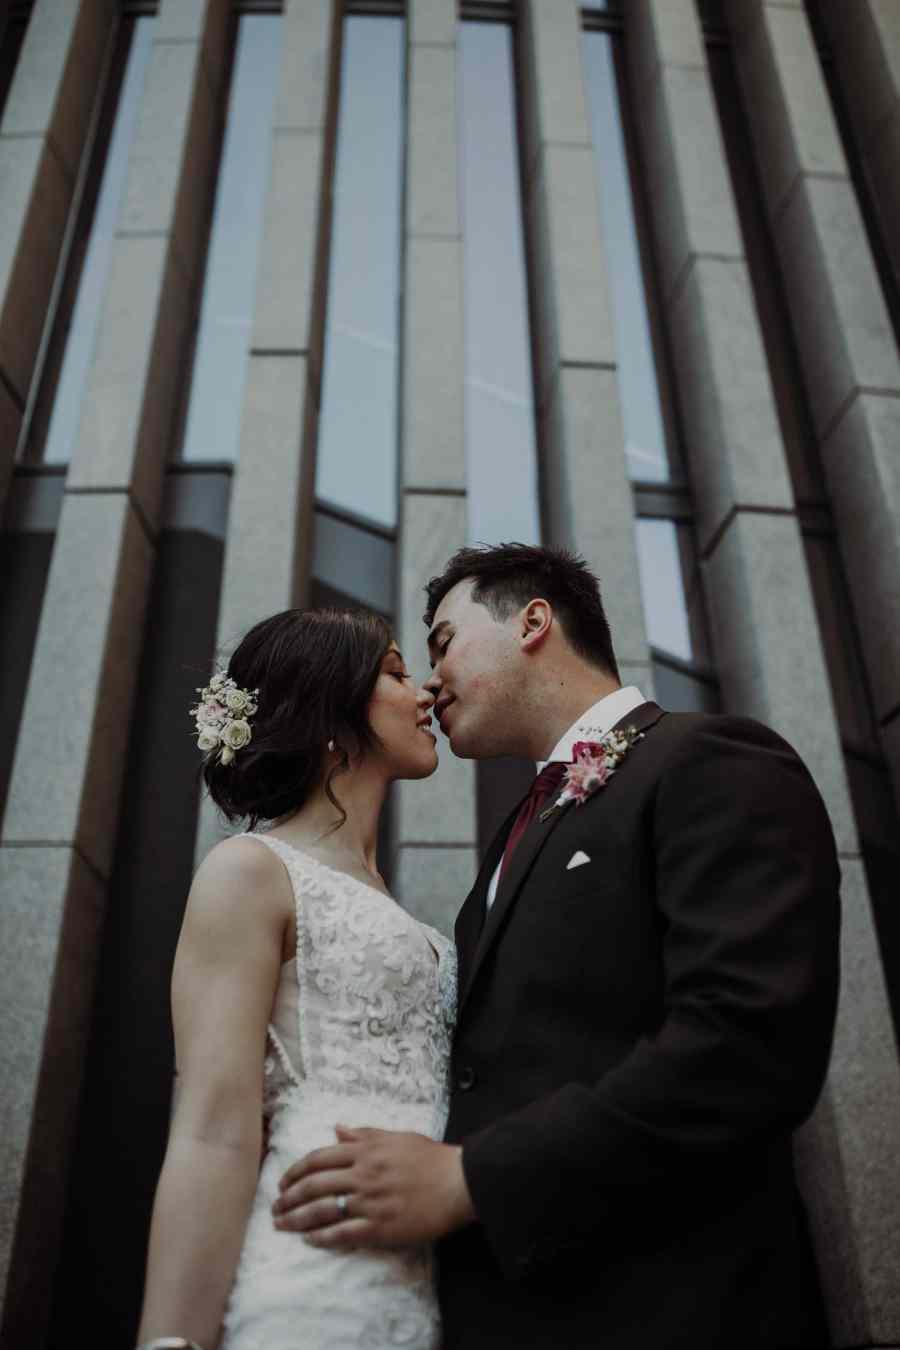 Ebony Blush Photography   Perth Wedding Photographer   Photography + Film   Sandalford Winery   Como Treasury Wedding   Perth City Wedding  Alex + Mel70